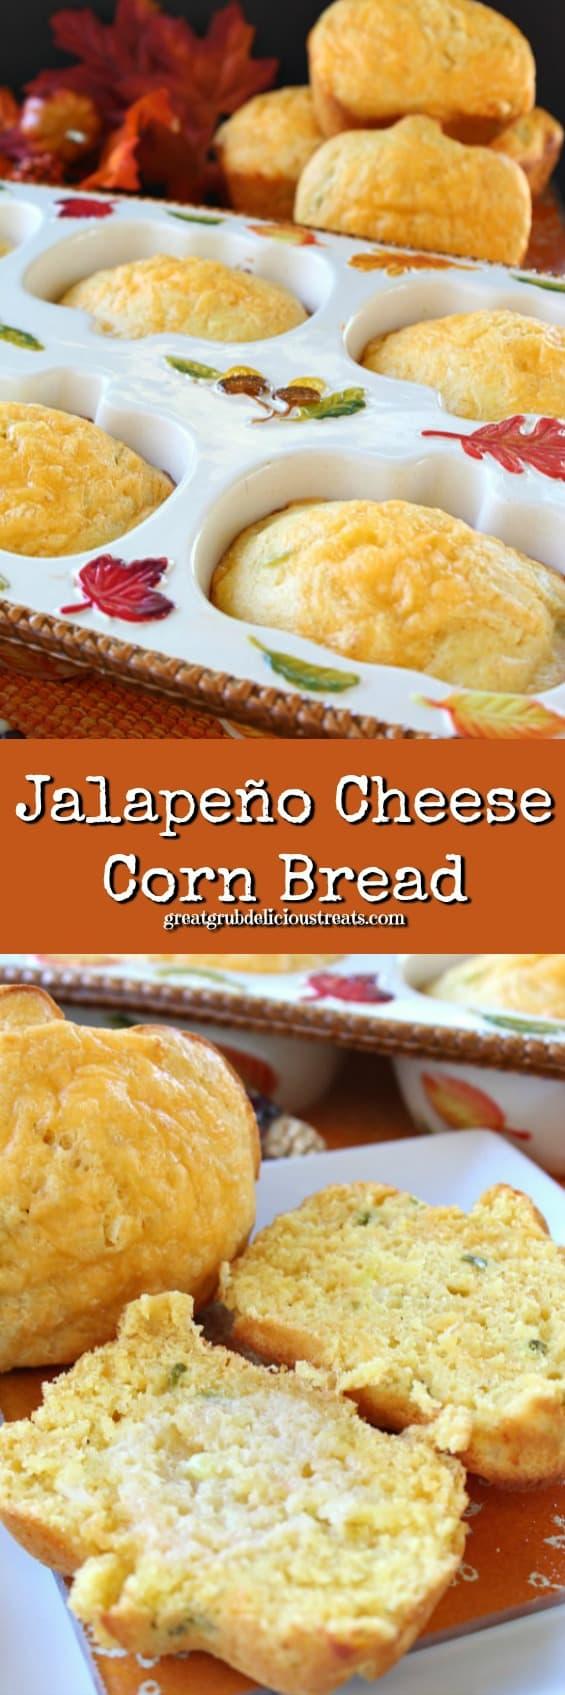 Jalapeño Cheese Corn Bread - Great Grub, Delicious Treats